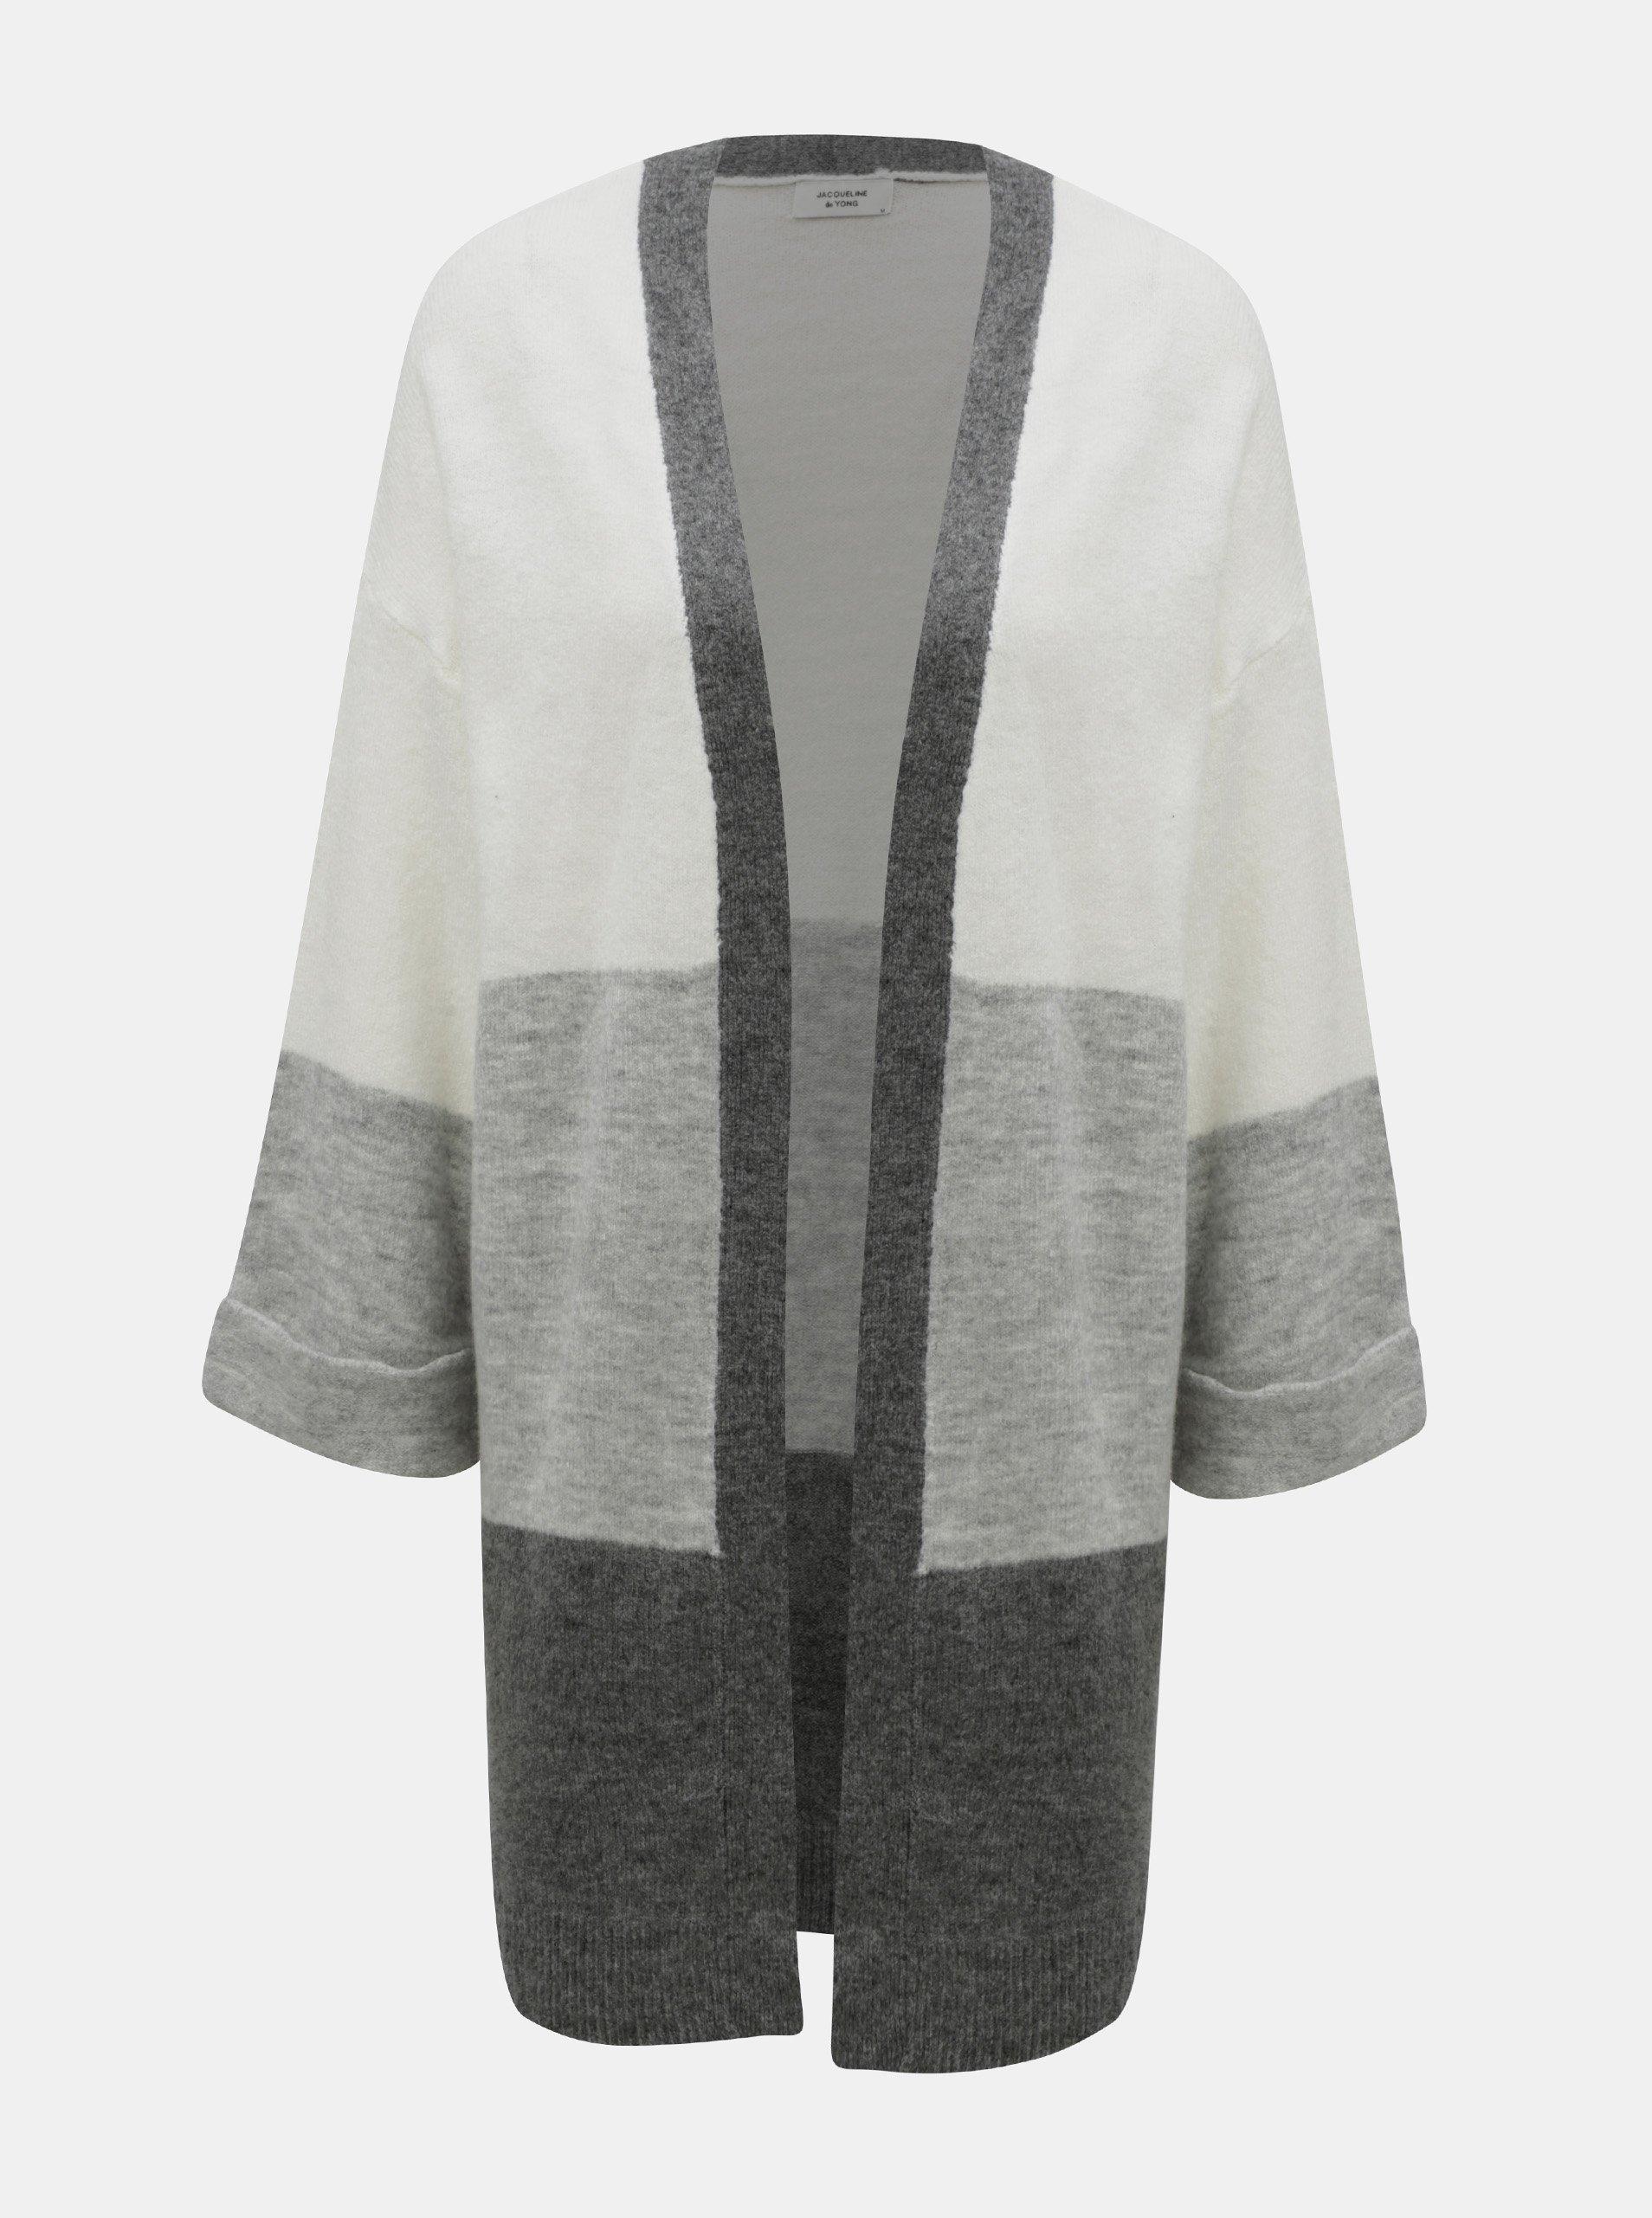 Krémovo-šedý žíhaný kardigan s volnými rukávy Jacqueline de Yong